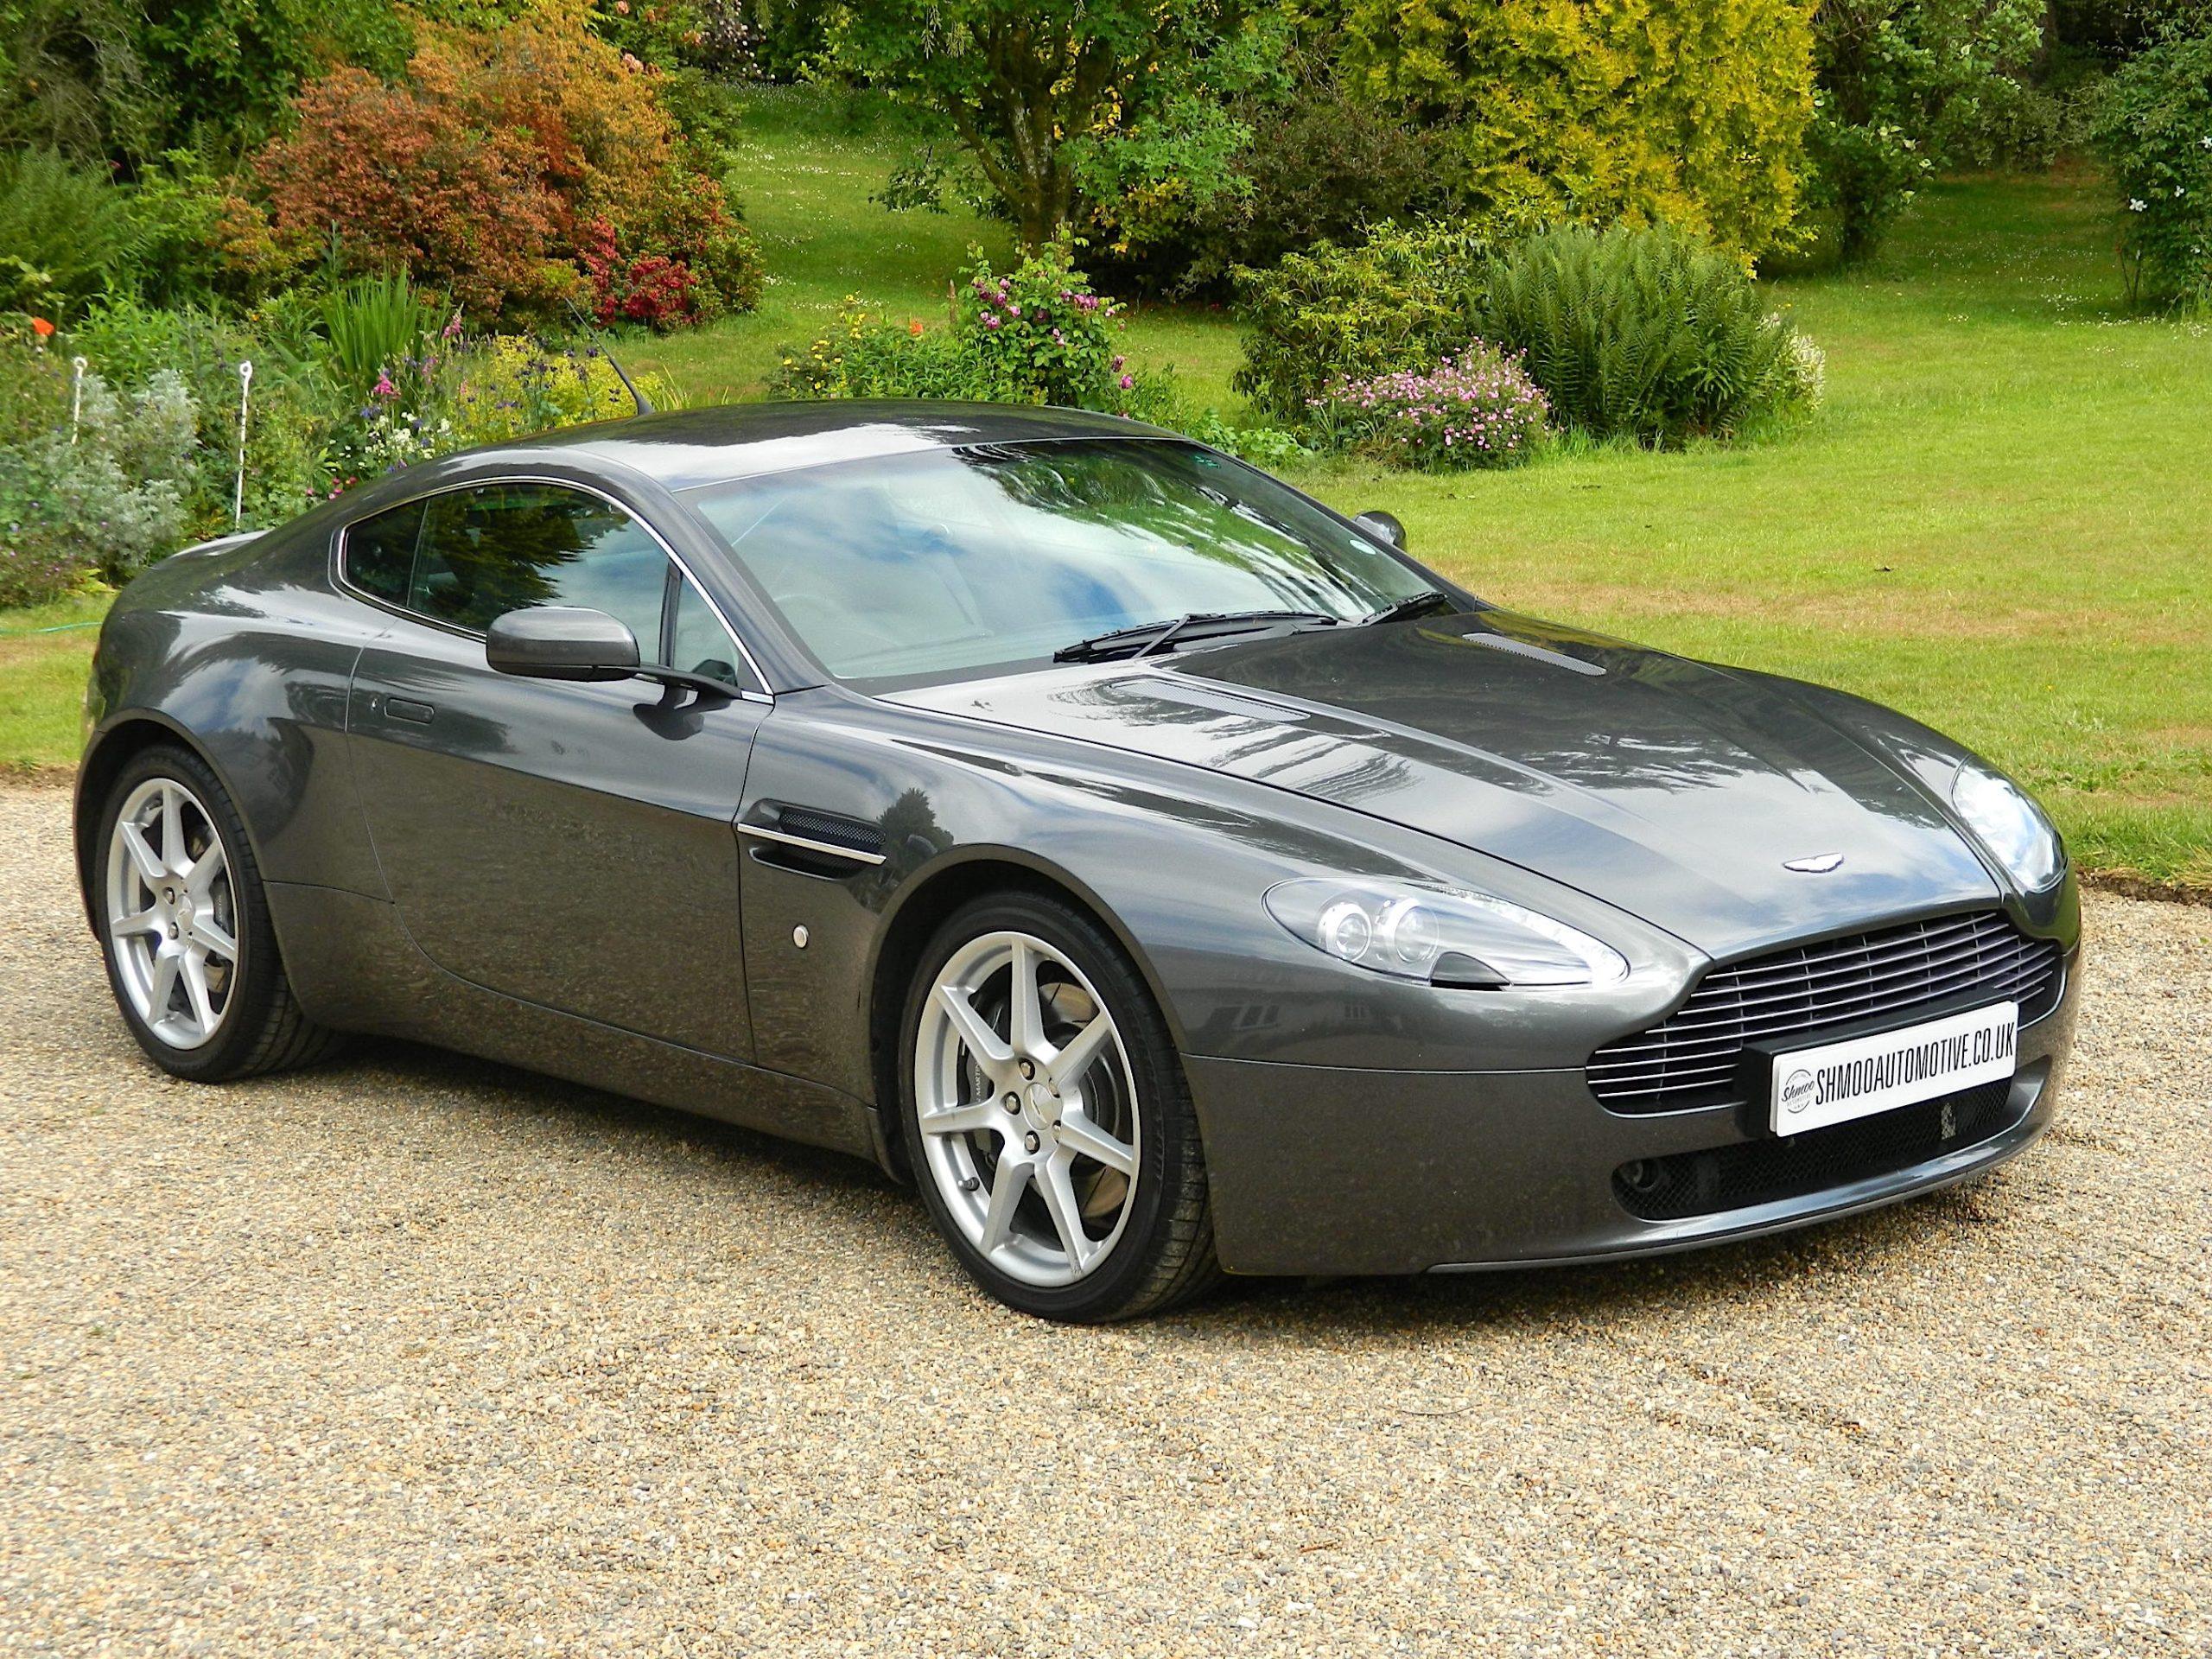 Aston Martin V8 Vantage 4 3 Coupe Manual Shmoo Automotive Tvr Sports Cars Sales Shmoo Automotive Tvr Sports Cars Sales